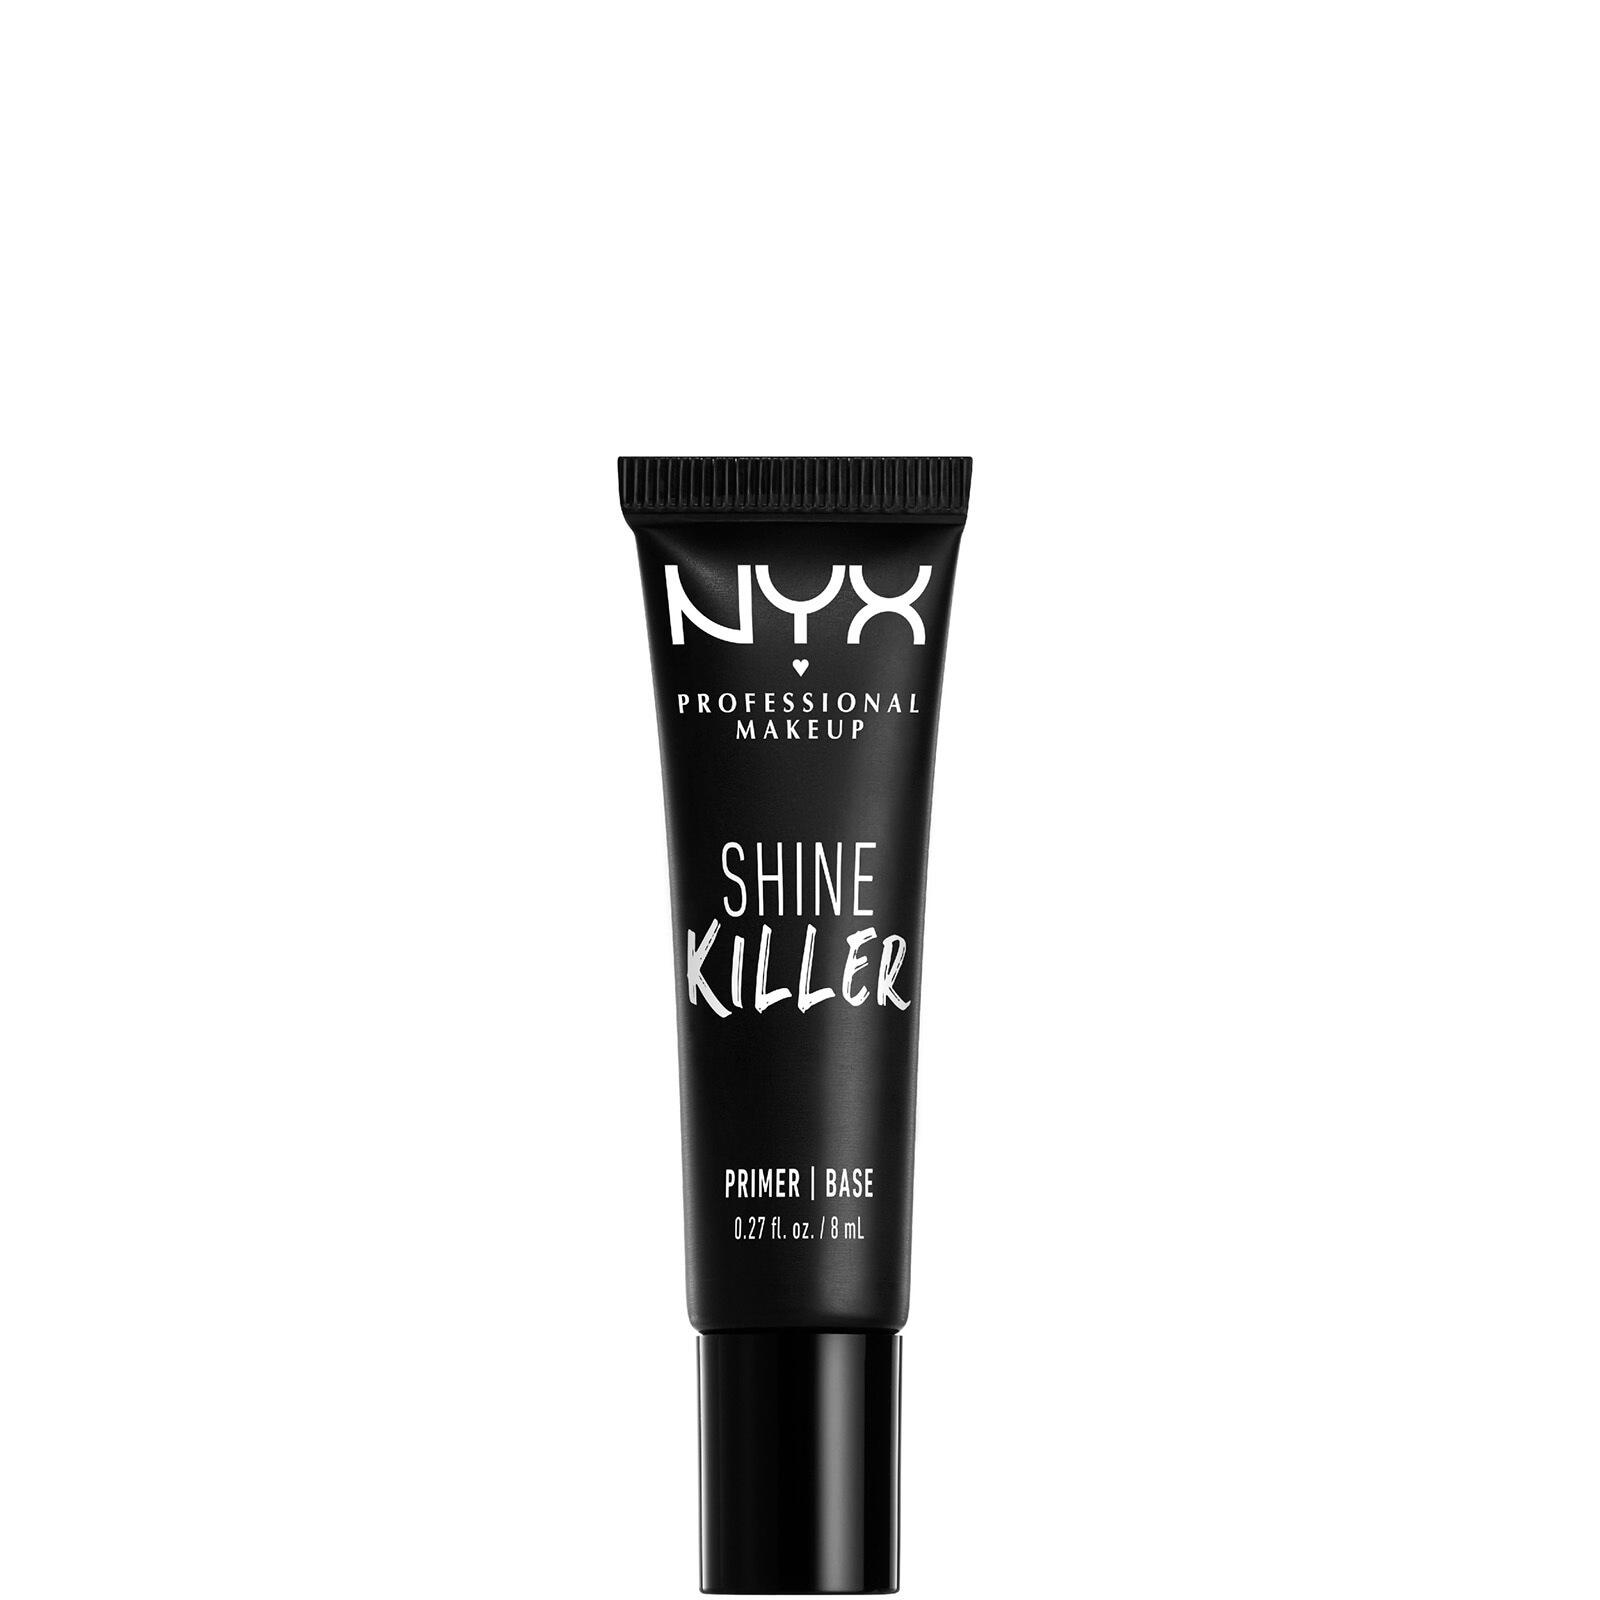 Купить Мини праймер для лица NYX Professional Makeup Mattifying Charcoal Infused Shine Killer 9 г